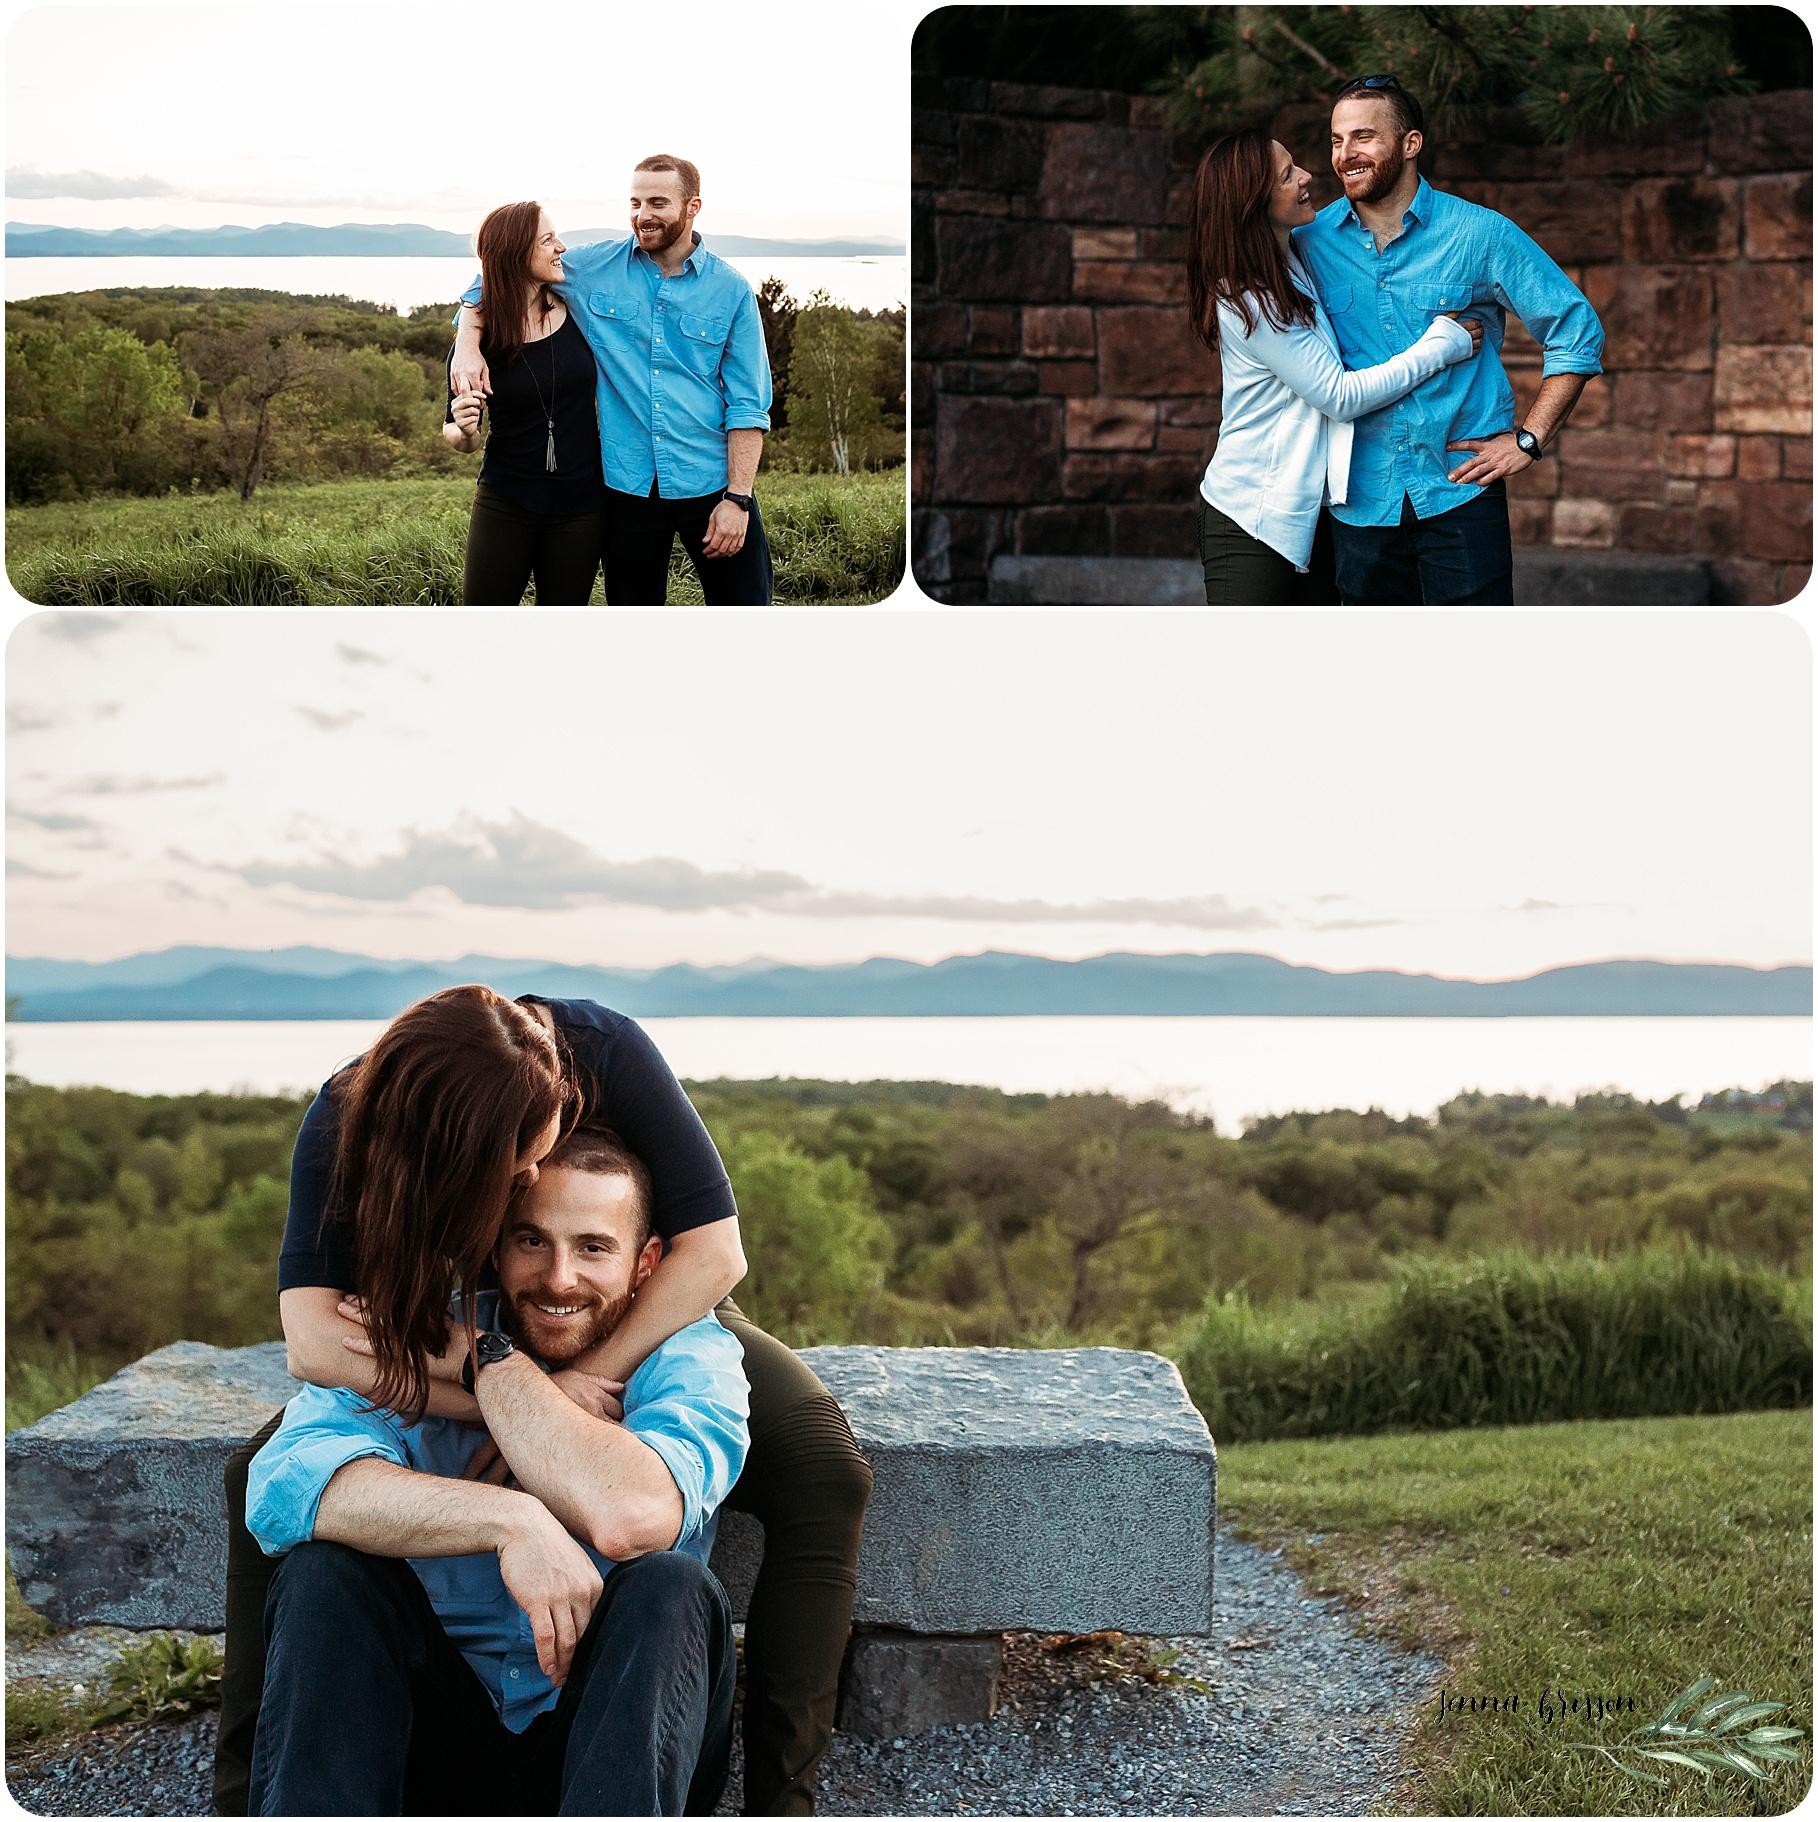 Shelburne Farms Engagement 2 - Jenna Brisson Photography